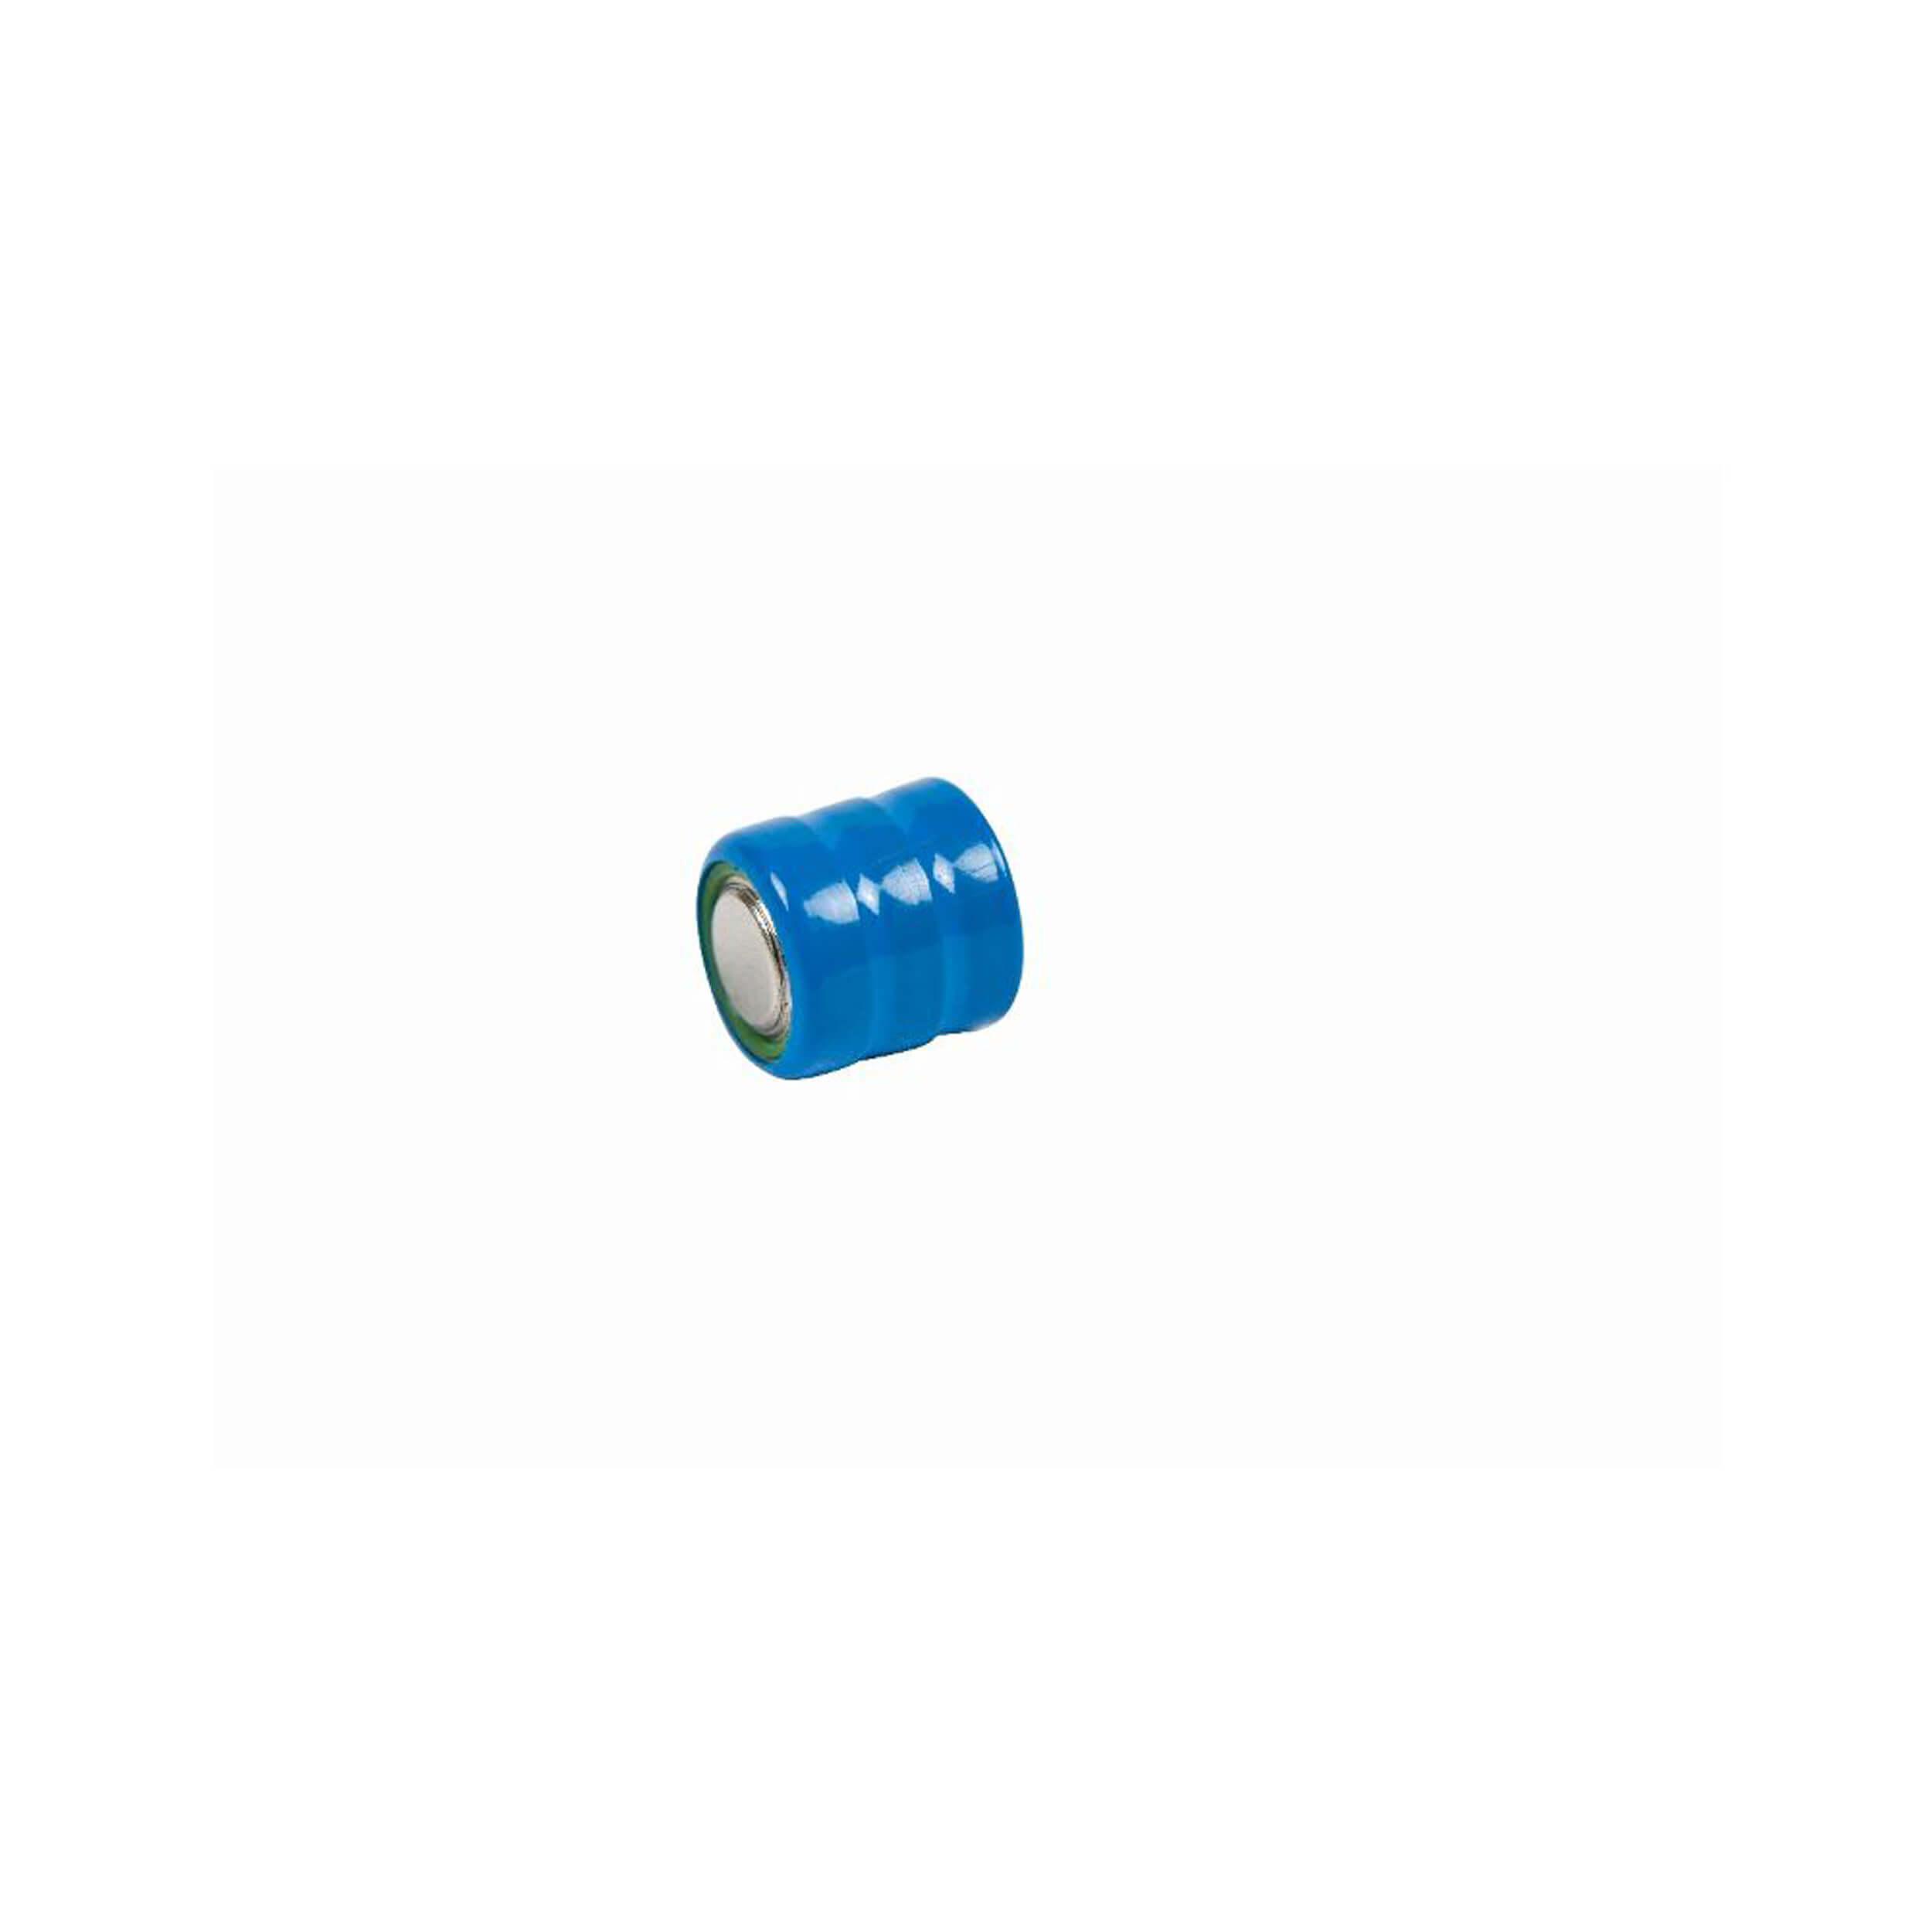 Battery Pack (3pcs)